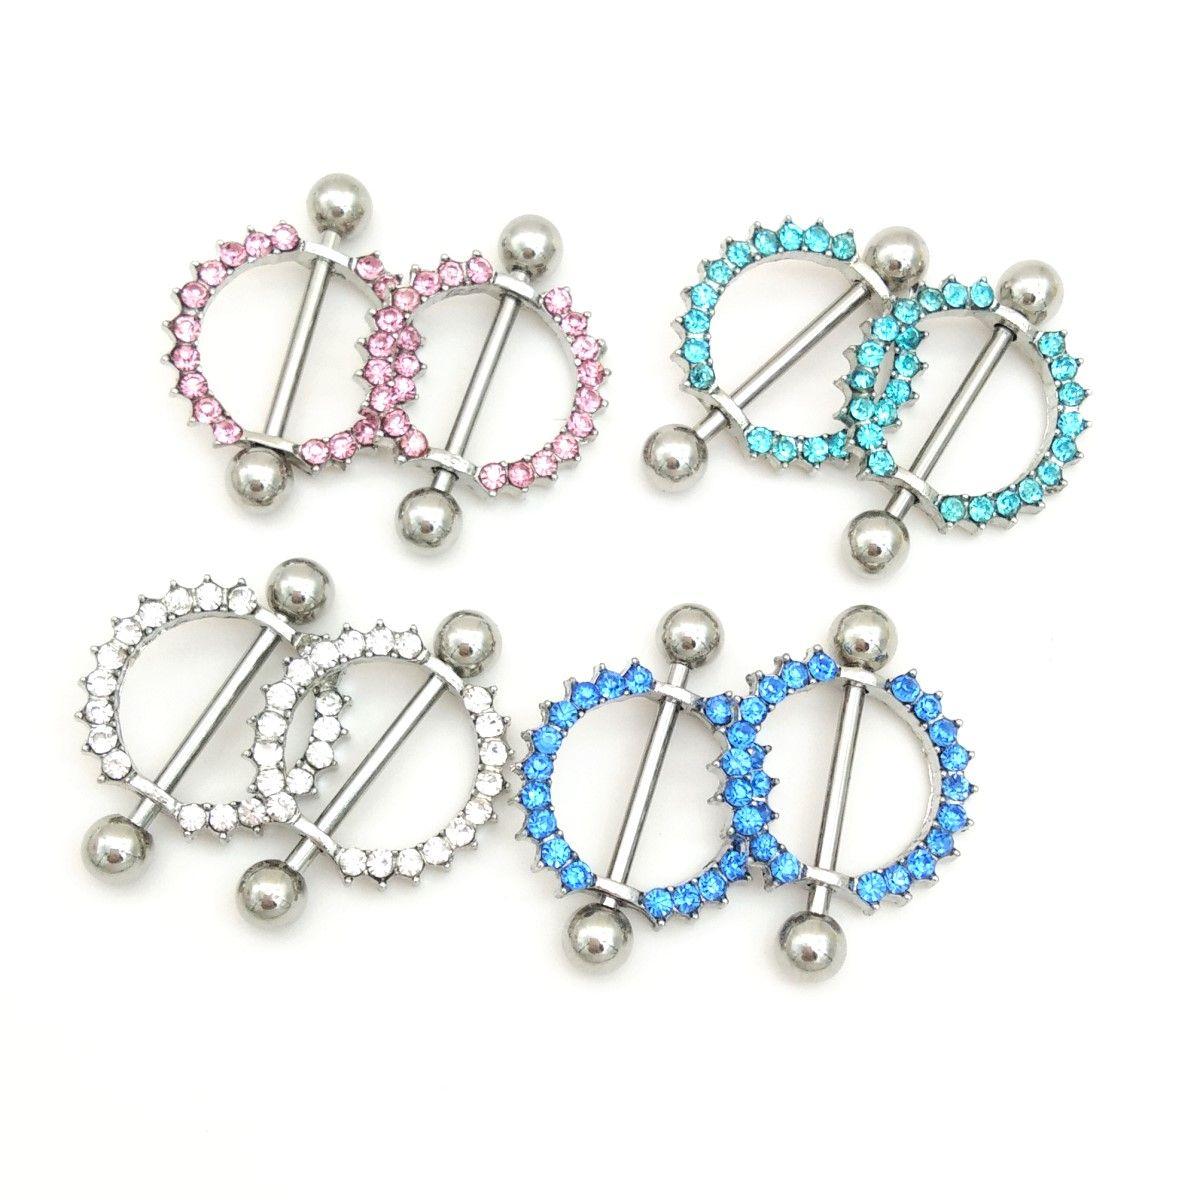 Rhinestone Nipple Piercing Fashion Body Piercing Gem Paved Circle Shield  Piercing Rings Body Jewelry for Women Girls de93ed9beb0e